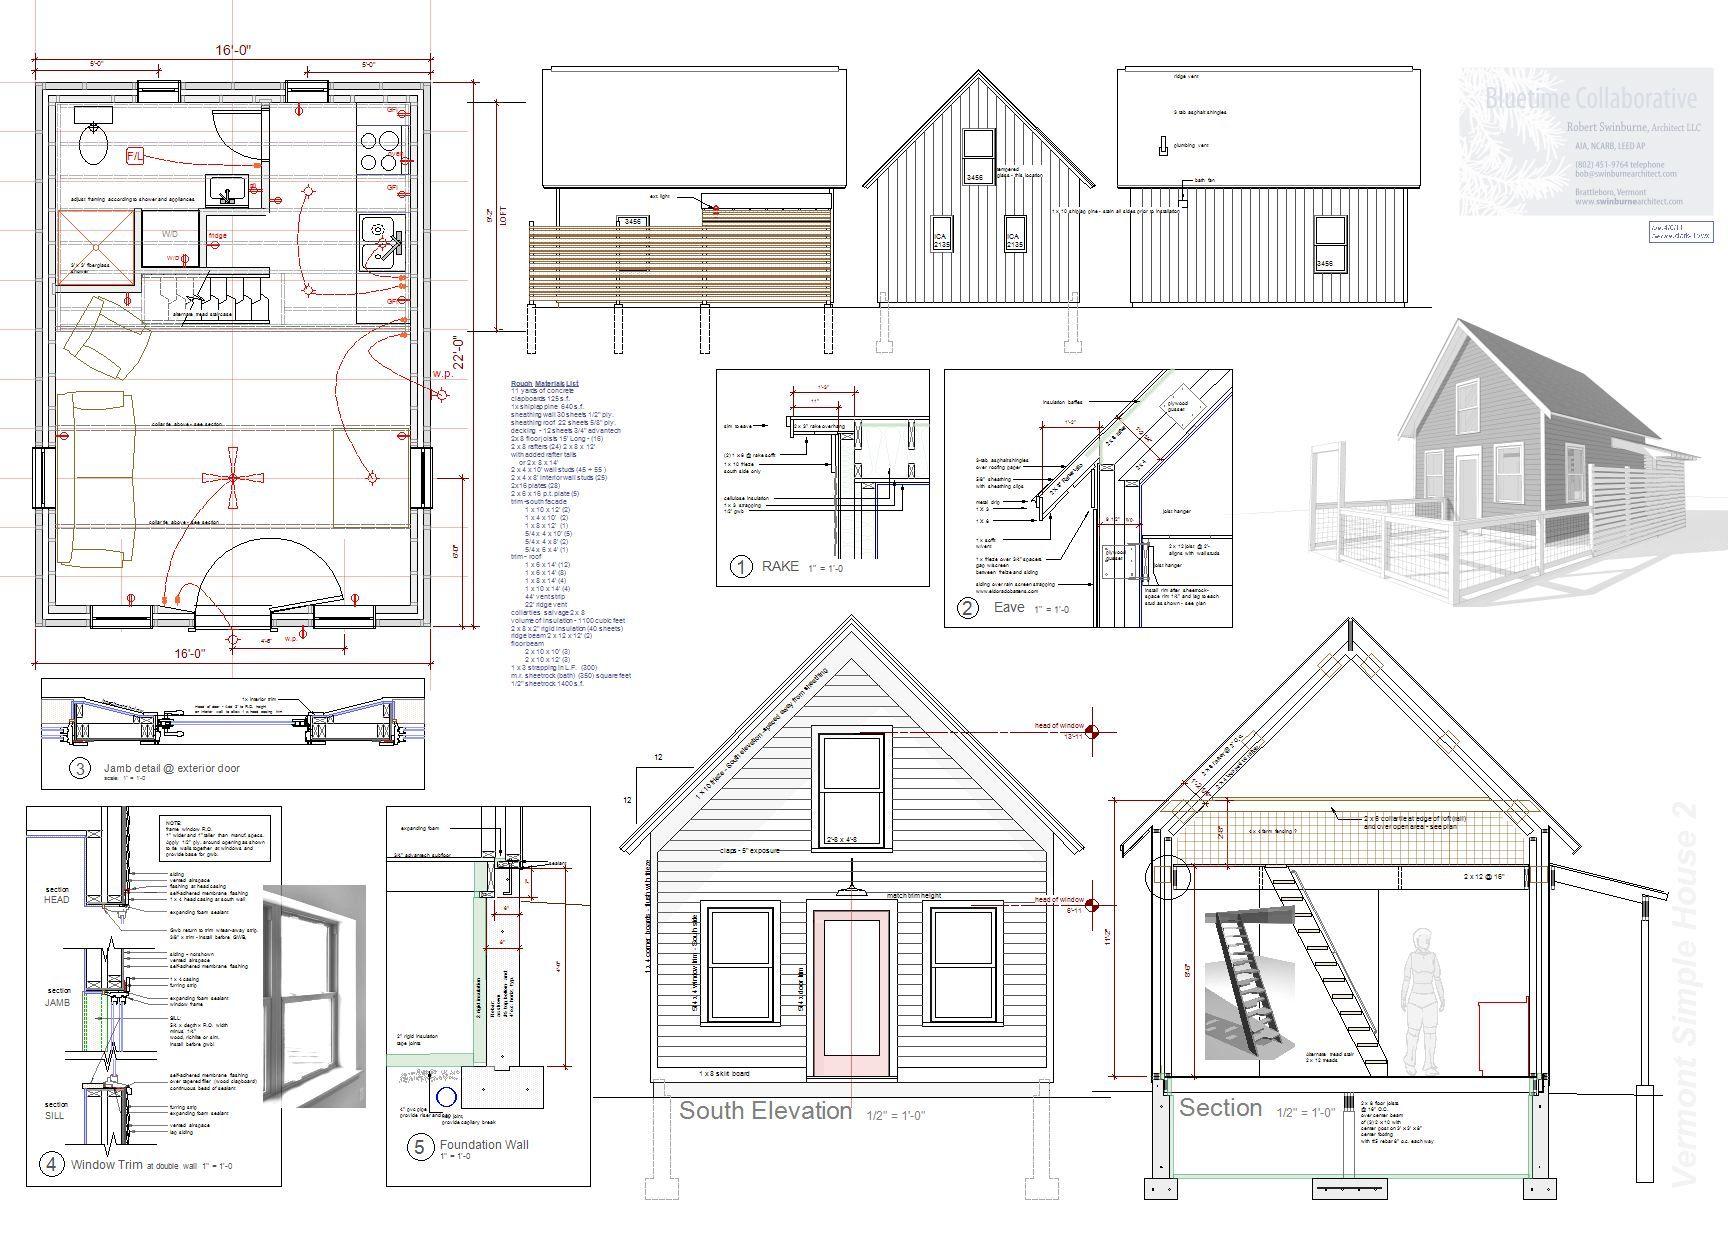 Magnificent 17 Best Images About Tiny House Plans Design Ideas On Pinterest Largest Home Design Picture Inspirations Pitcheantrous